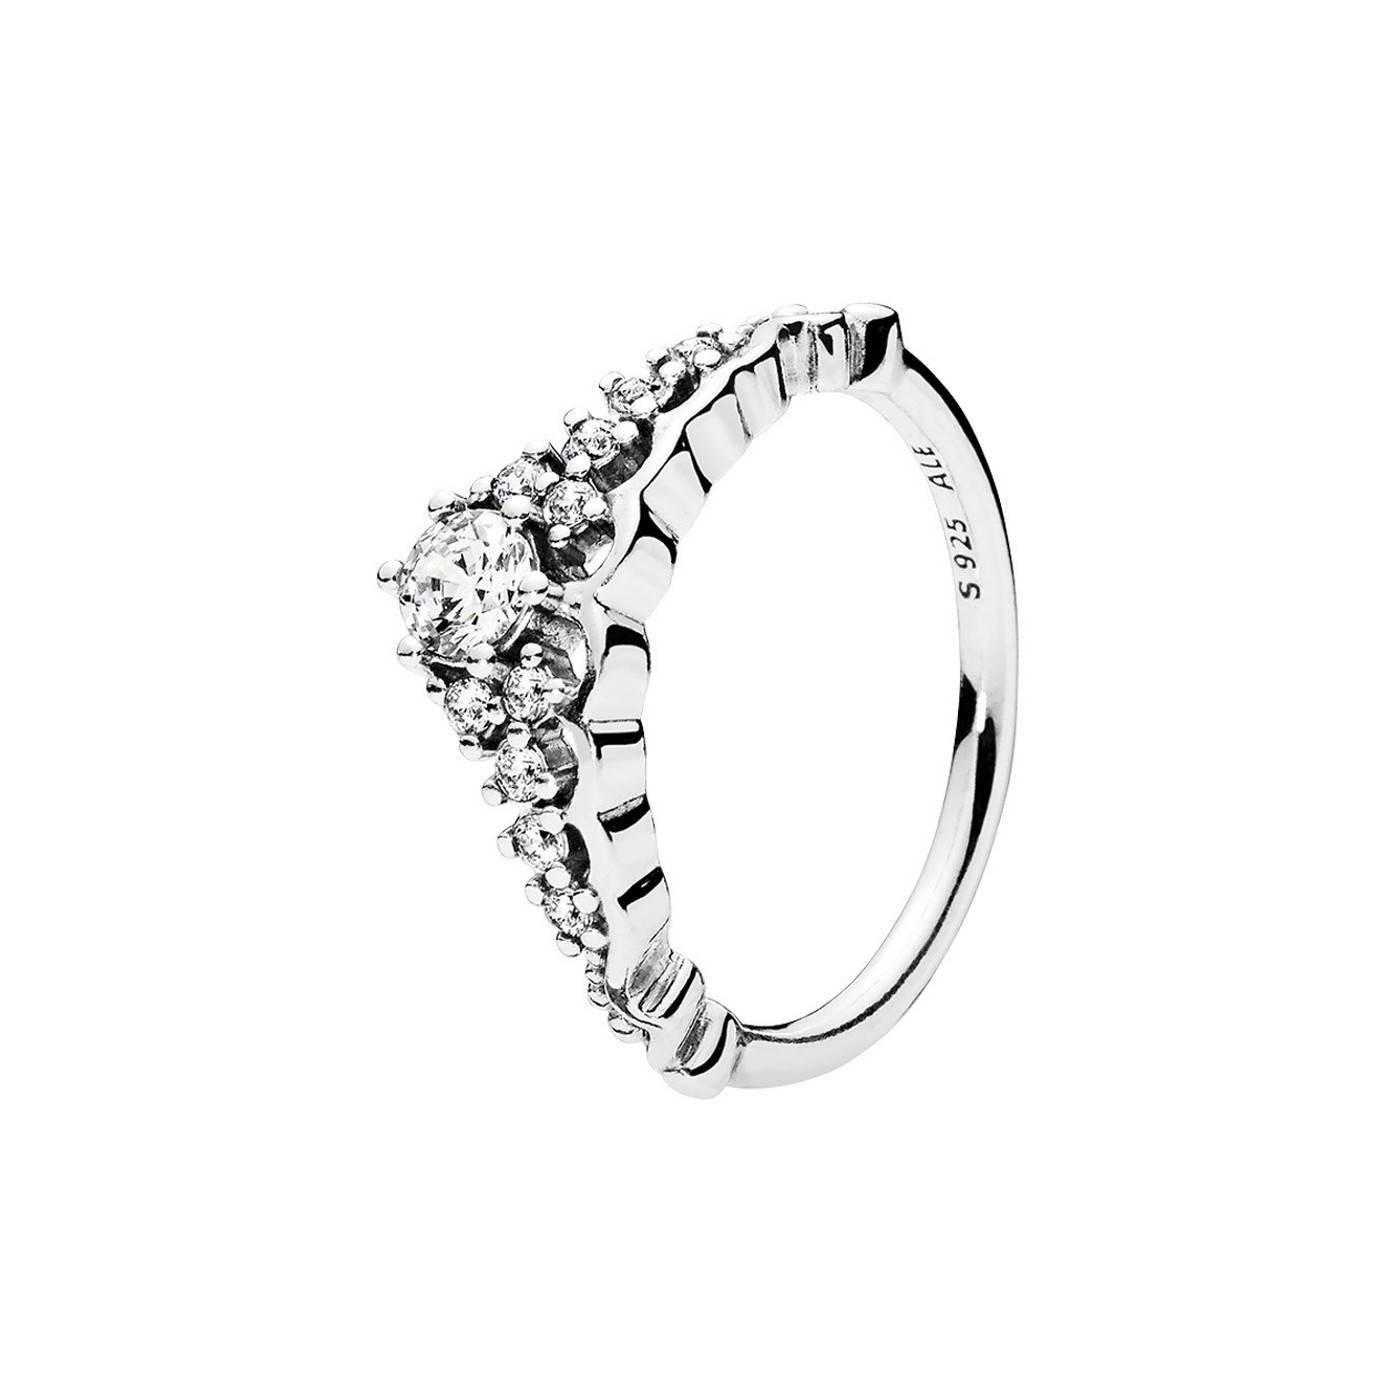 3a3a1f47d Pandora Stories Ring 196226CZ - Jewelry